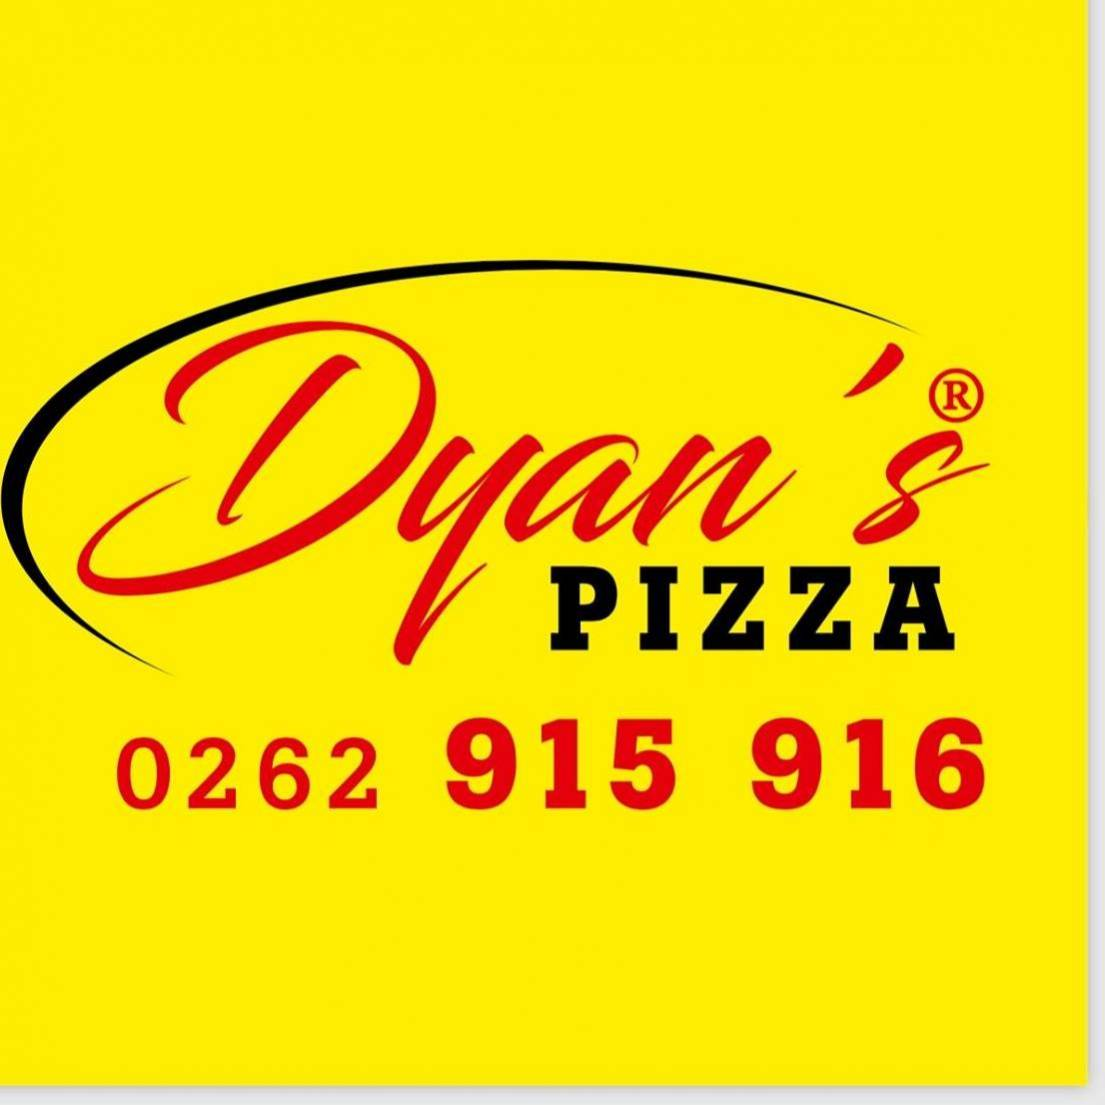 DYAN'S PIZZA PIZZERIA SAINT PAUL REUNION 974